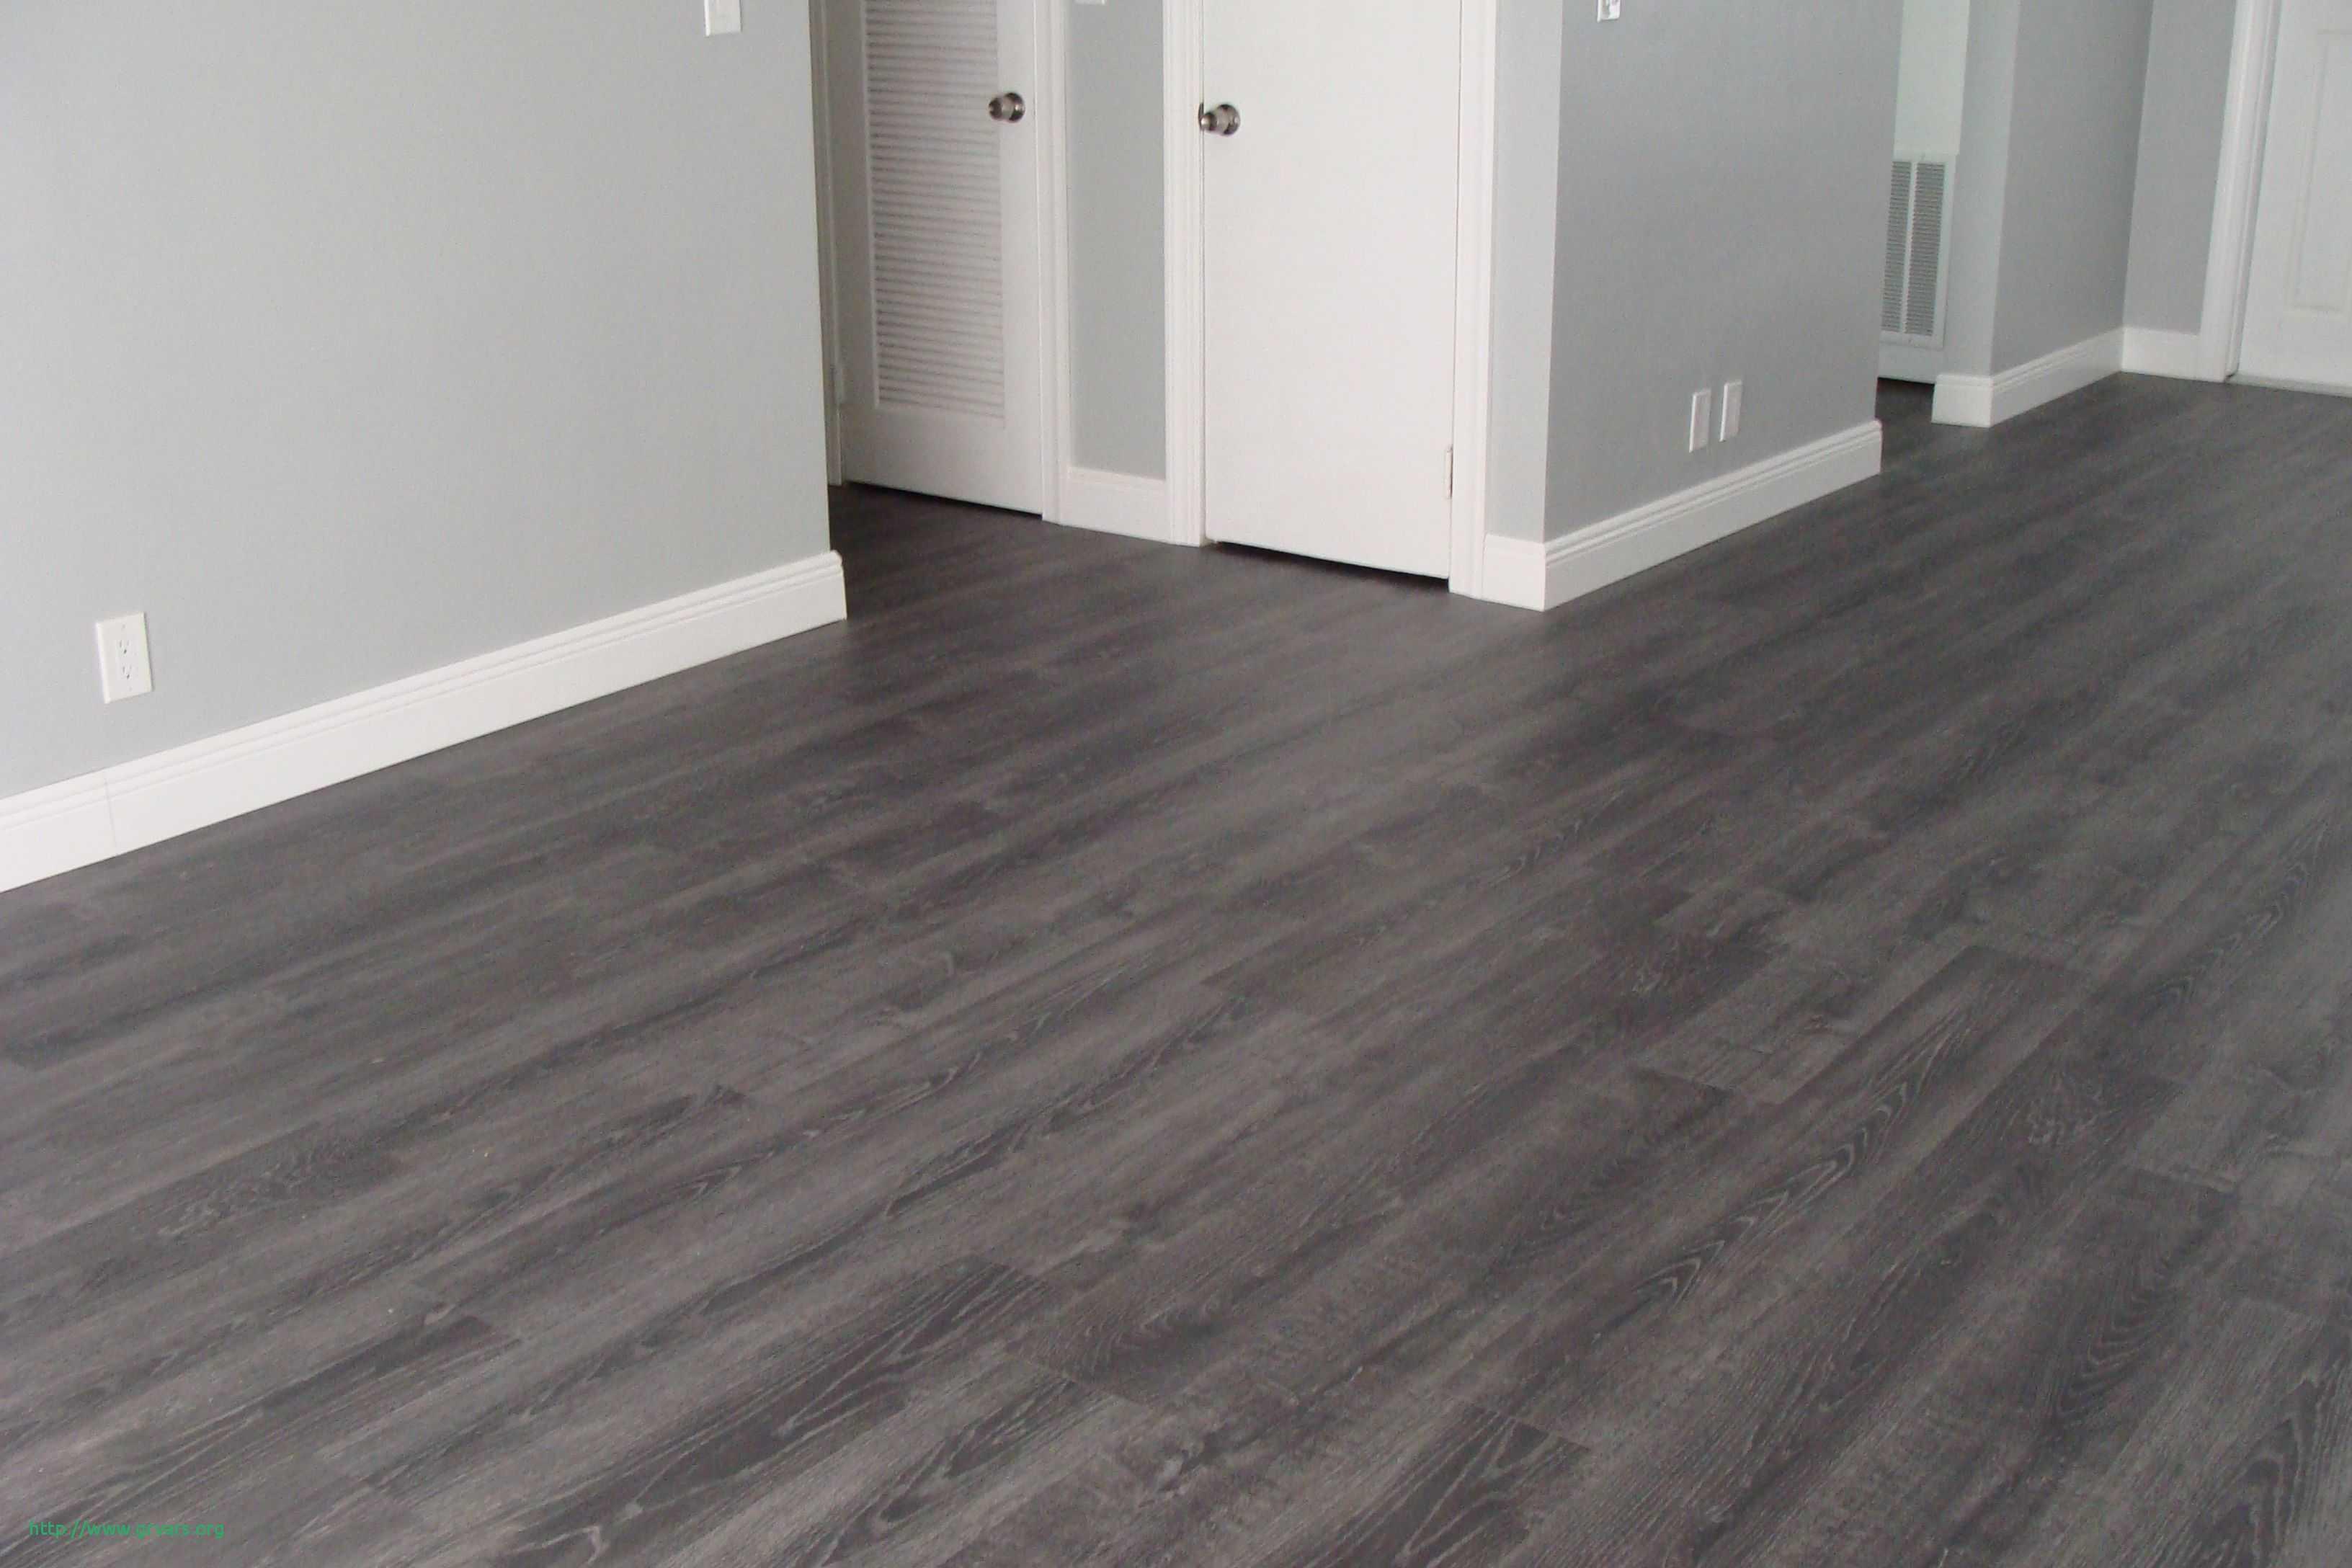 cheap hardwood flooring glasgow of 20 beau cheap laminate flooring las vegas ideas blog with cheap laminate flooring las vegas a‰lagant kronoswiss noblesse tokyo oak d8012nm laminate flooring